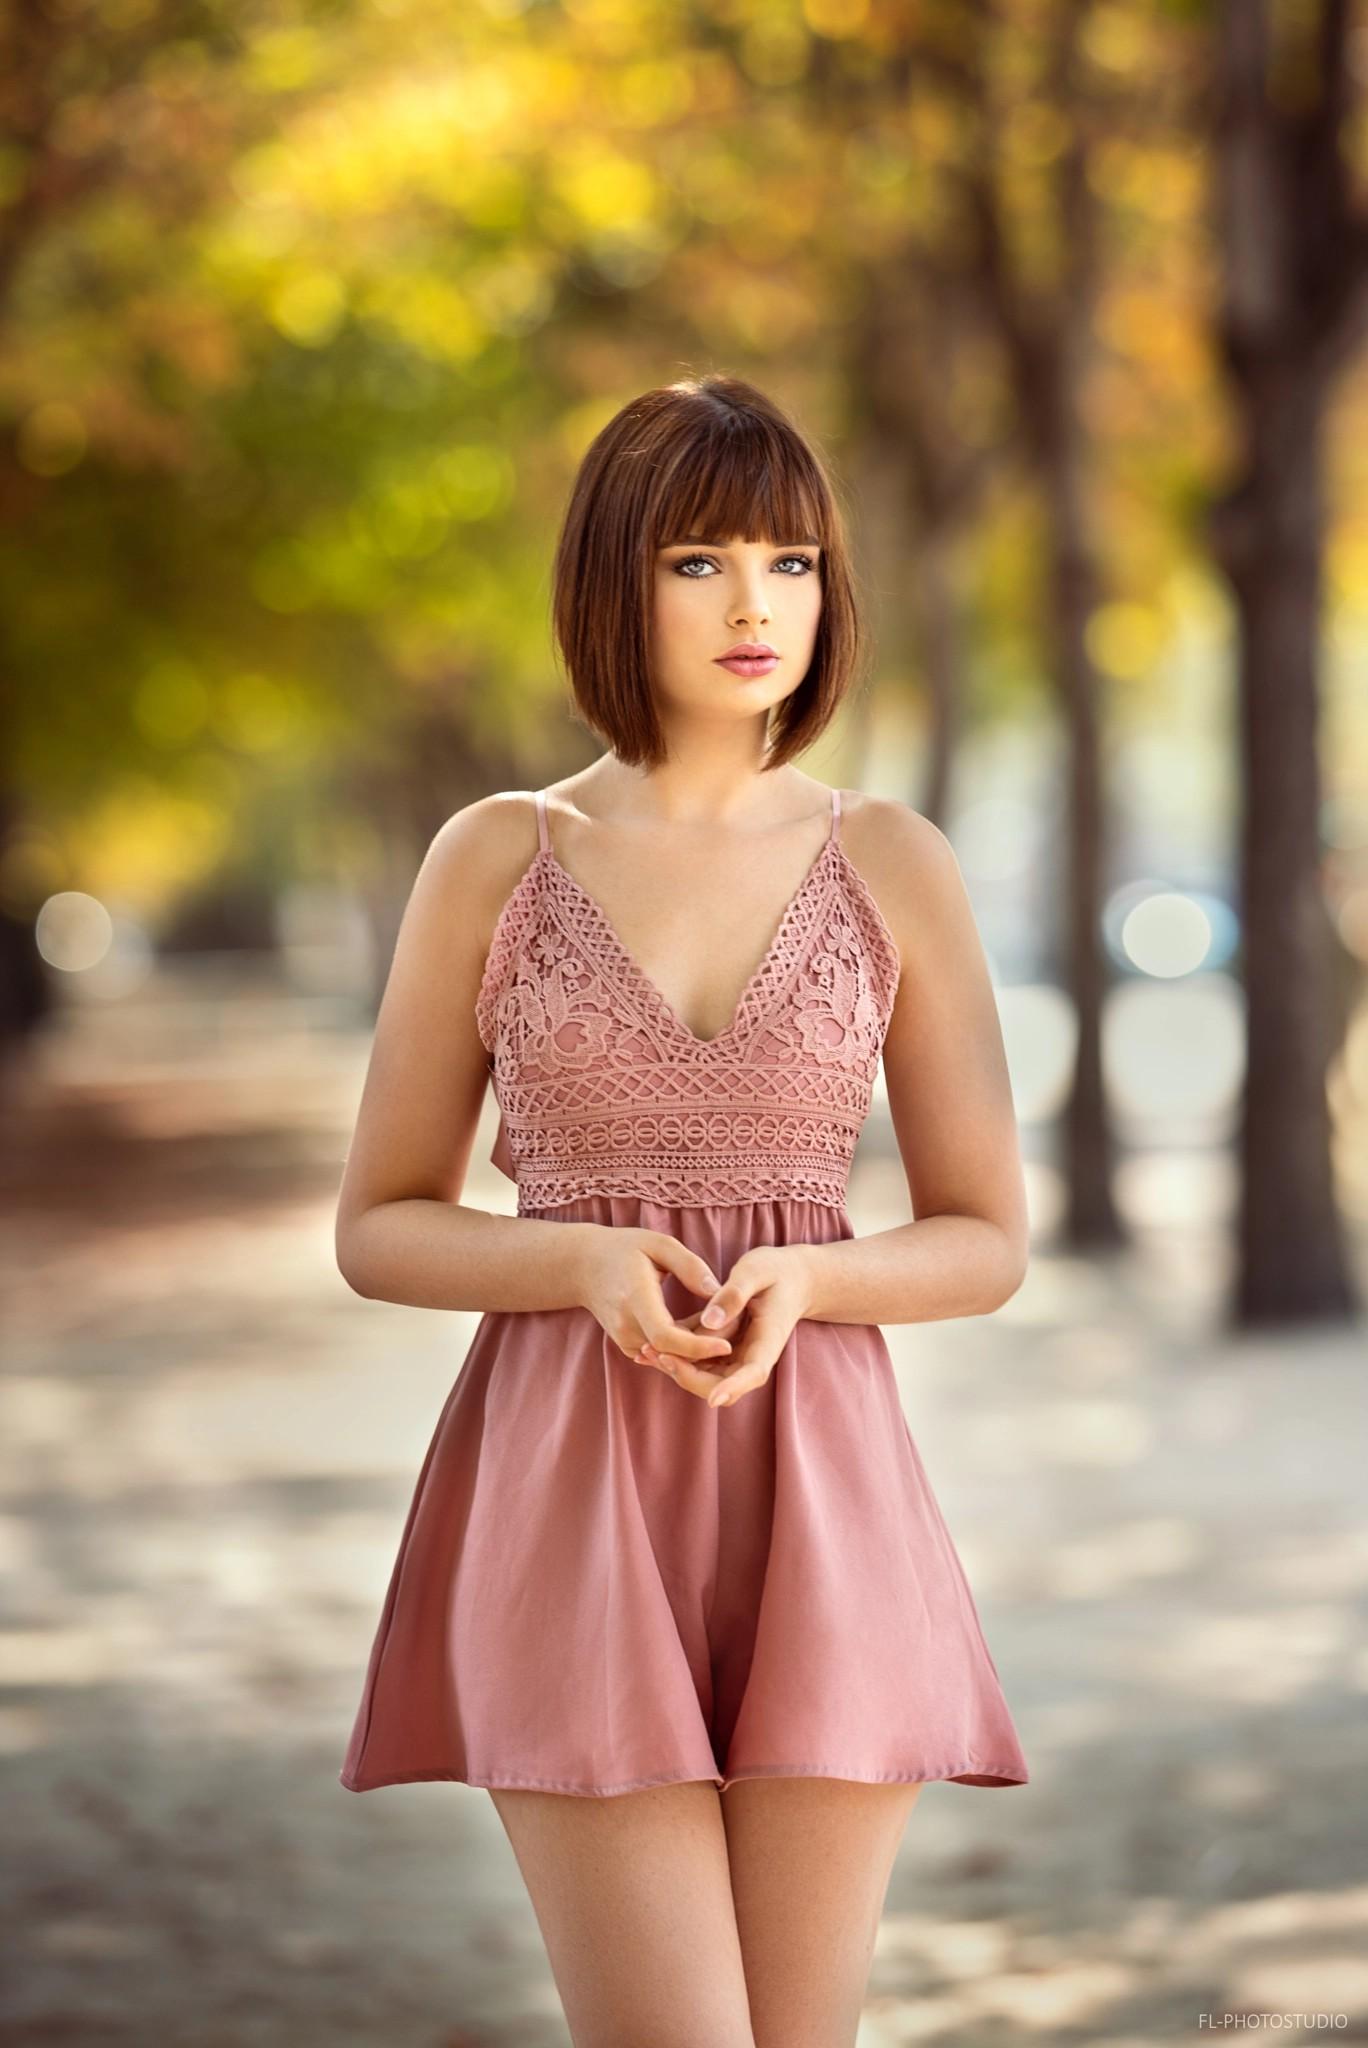 Wallpaper  Marie Grippon, Short Hair, Bare Shoulders, Women Outdoors, Brunette -5517